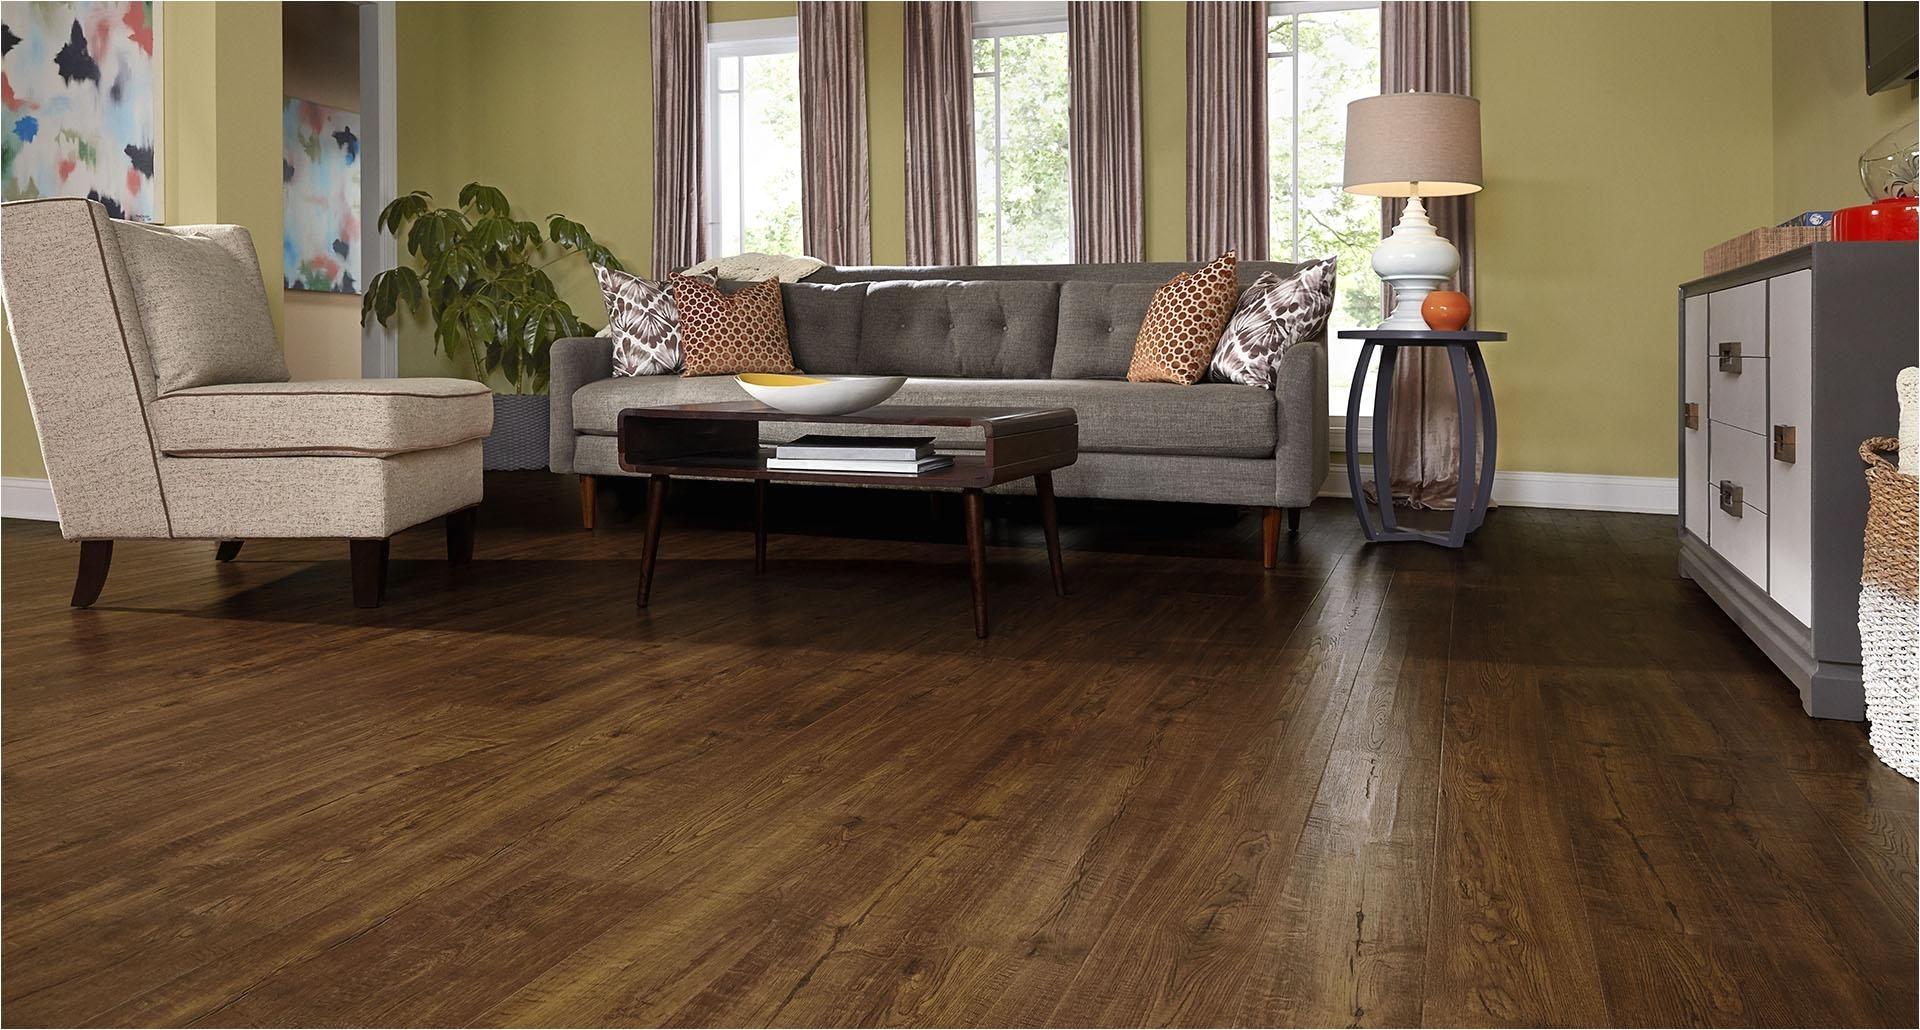 mohawk pergo auburn scraped oak 6 hand scraped laminate flooring